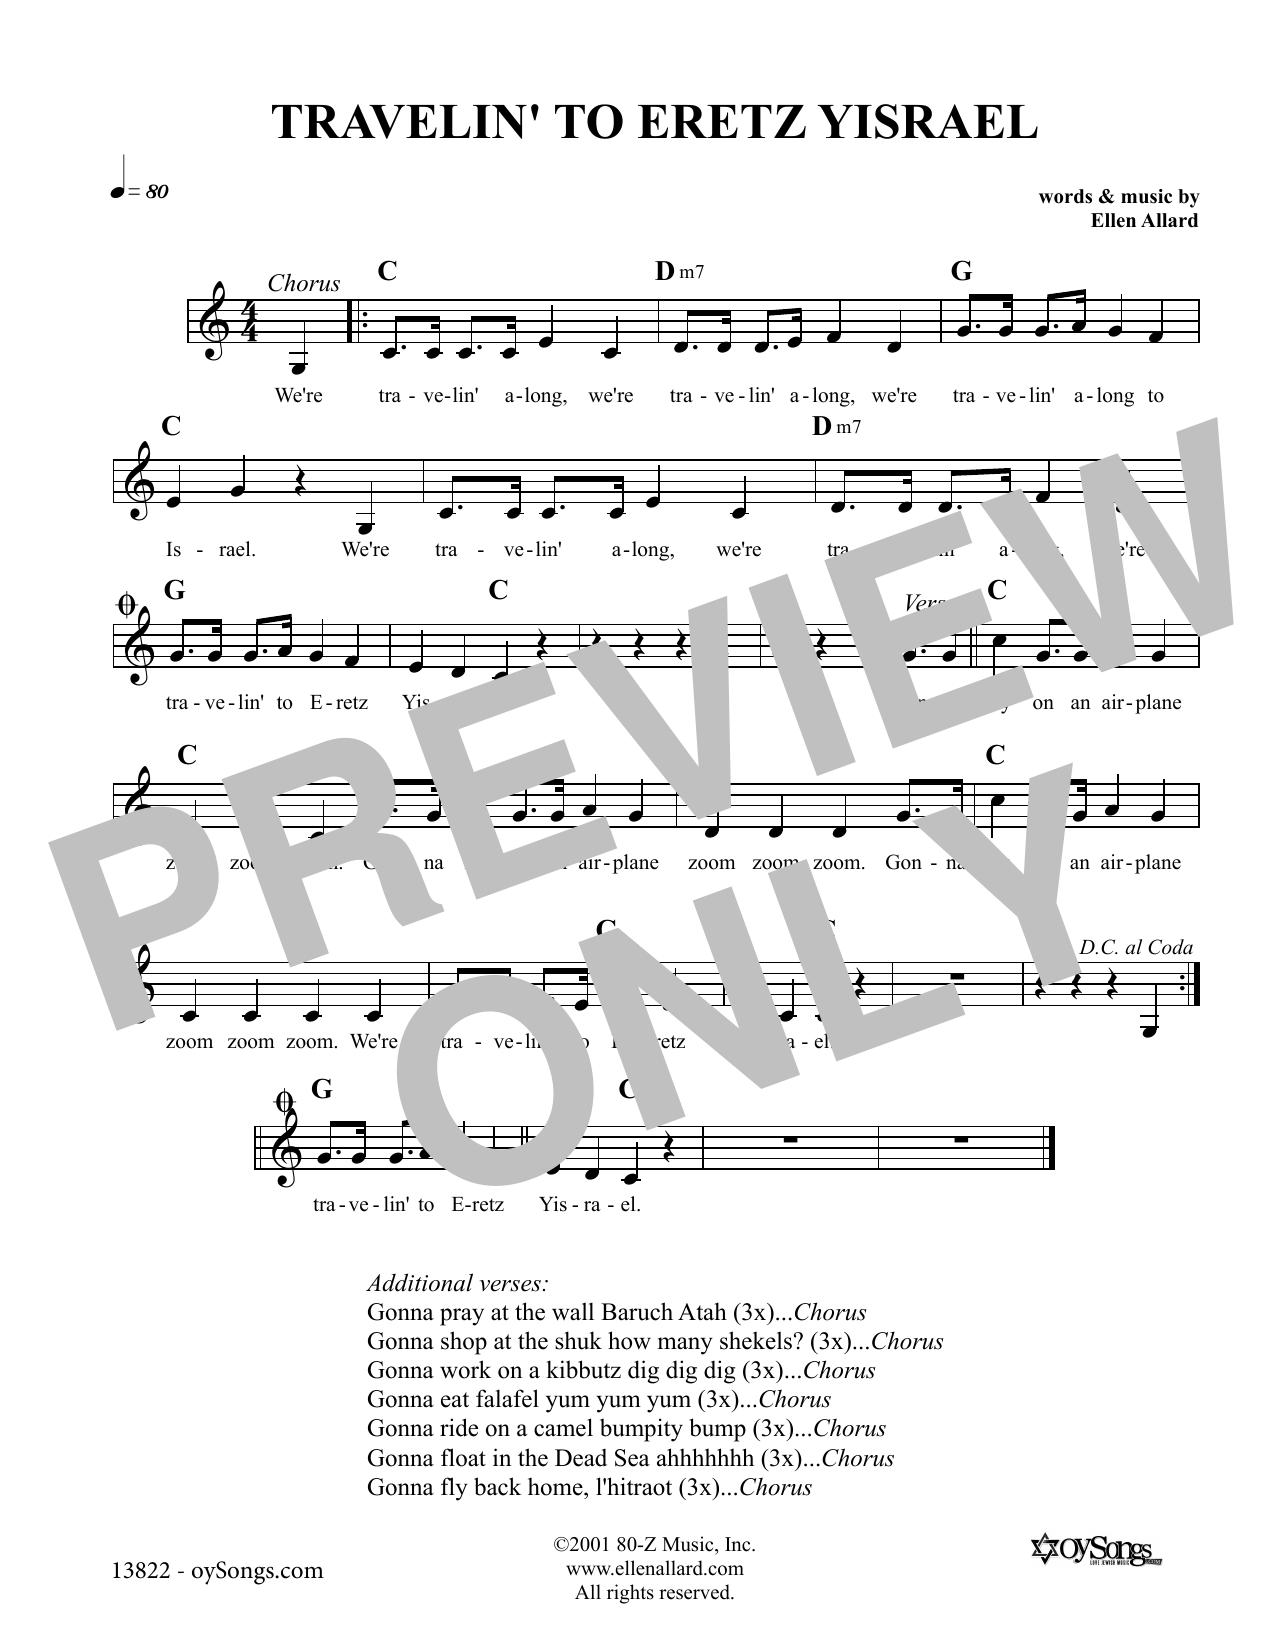 Ellen Allard Travelin' To Eretz Yisrael sheet music notes and chords. Download Printable PDF.